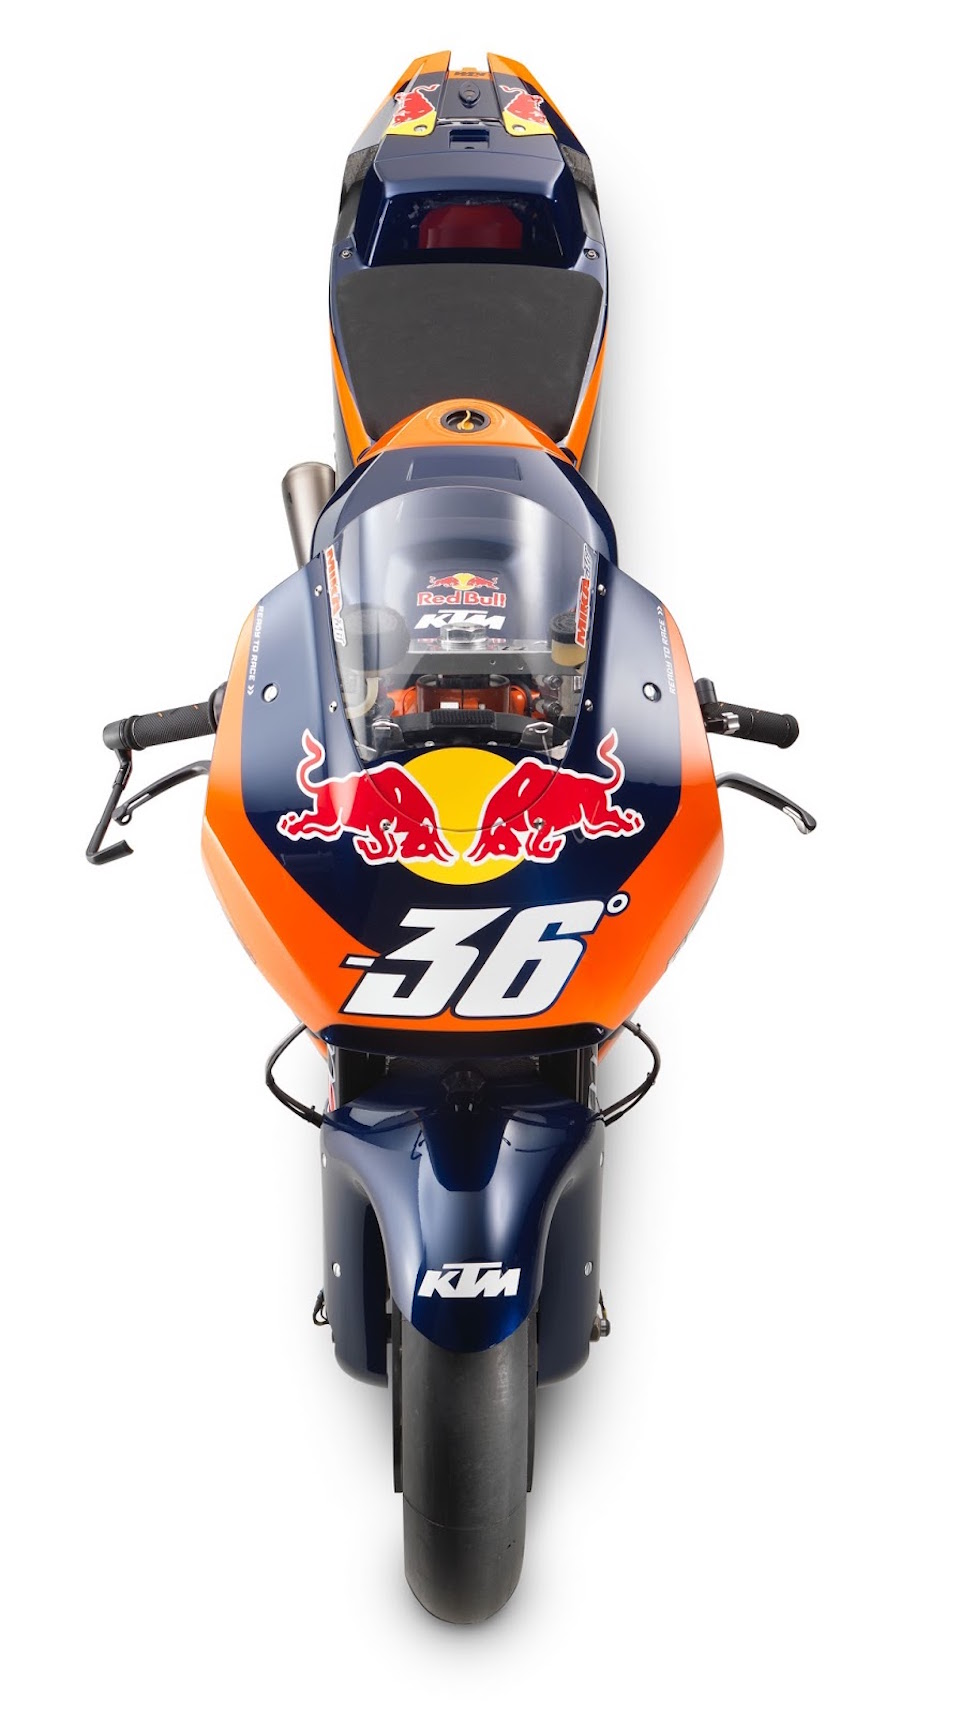 KTM chinh thuc ra mat RC16 chuan bi cho giai dua MotoGP 2017 - 6